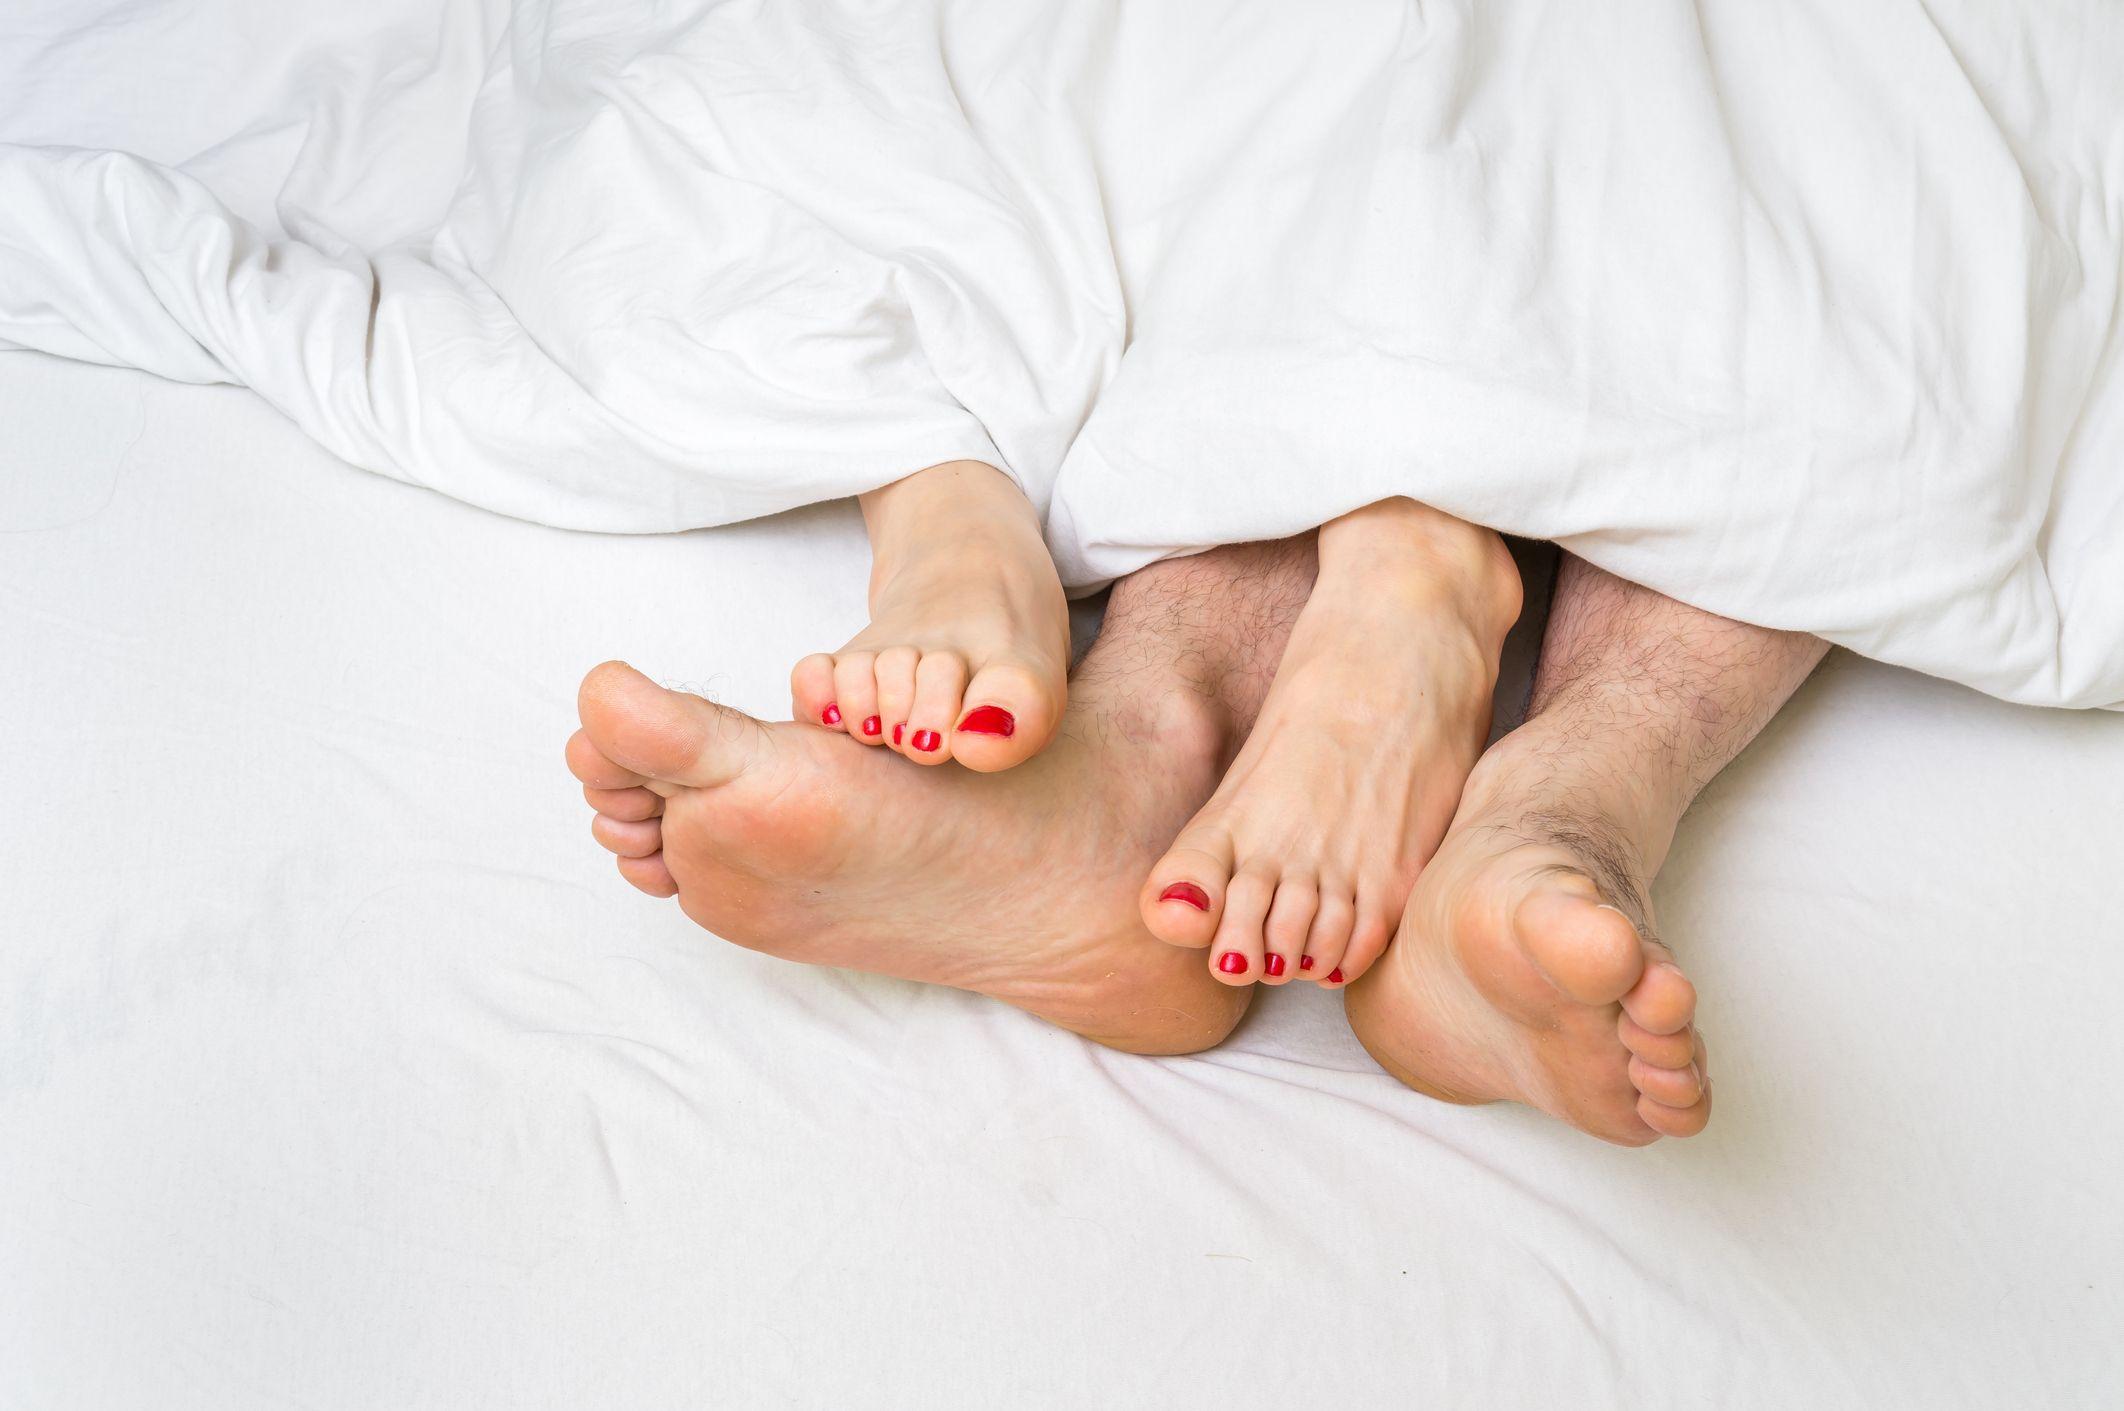 Sex injury alot of vaginal bledding